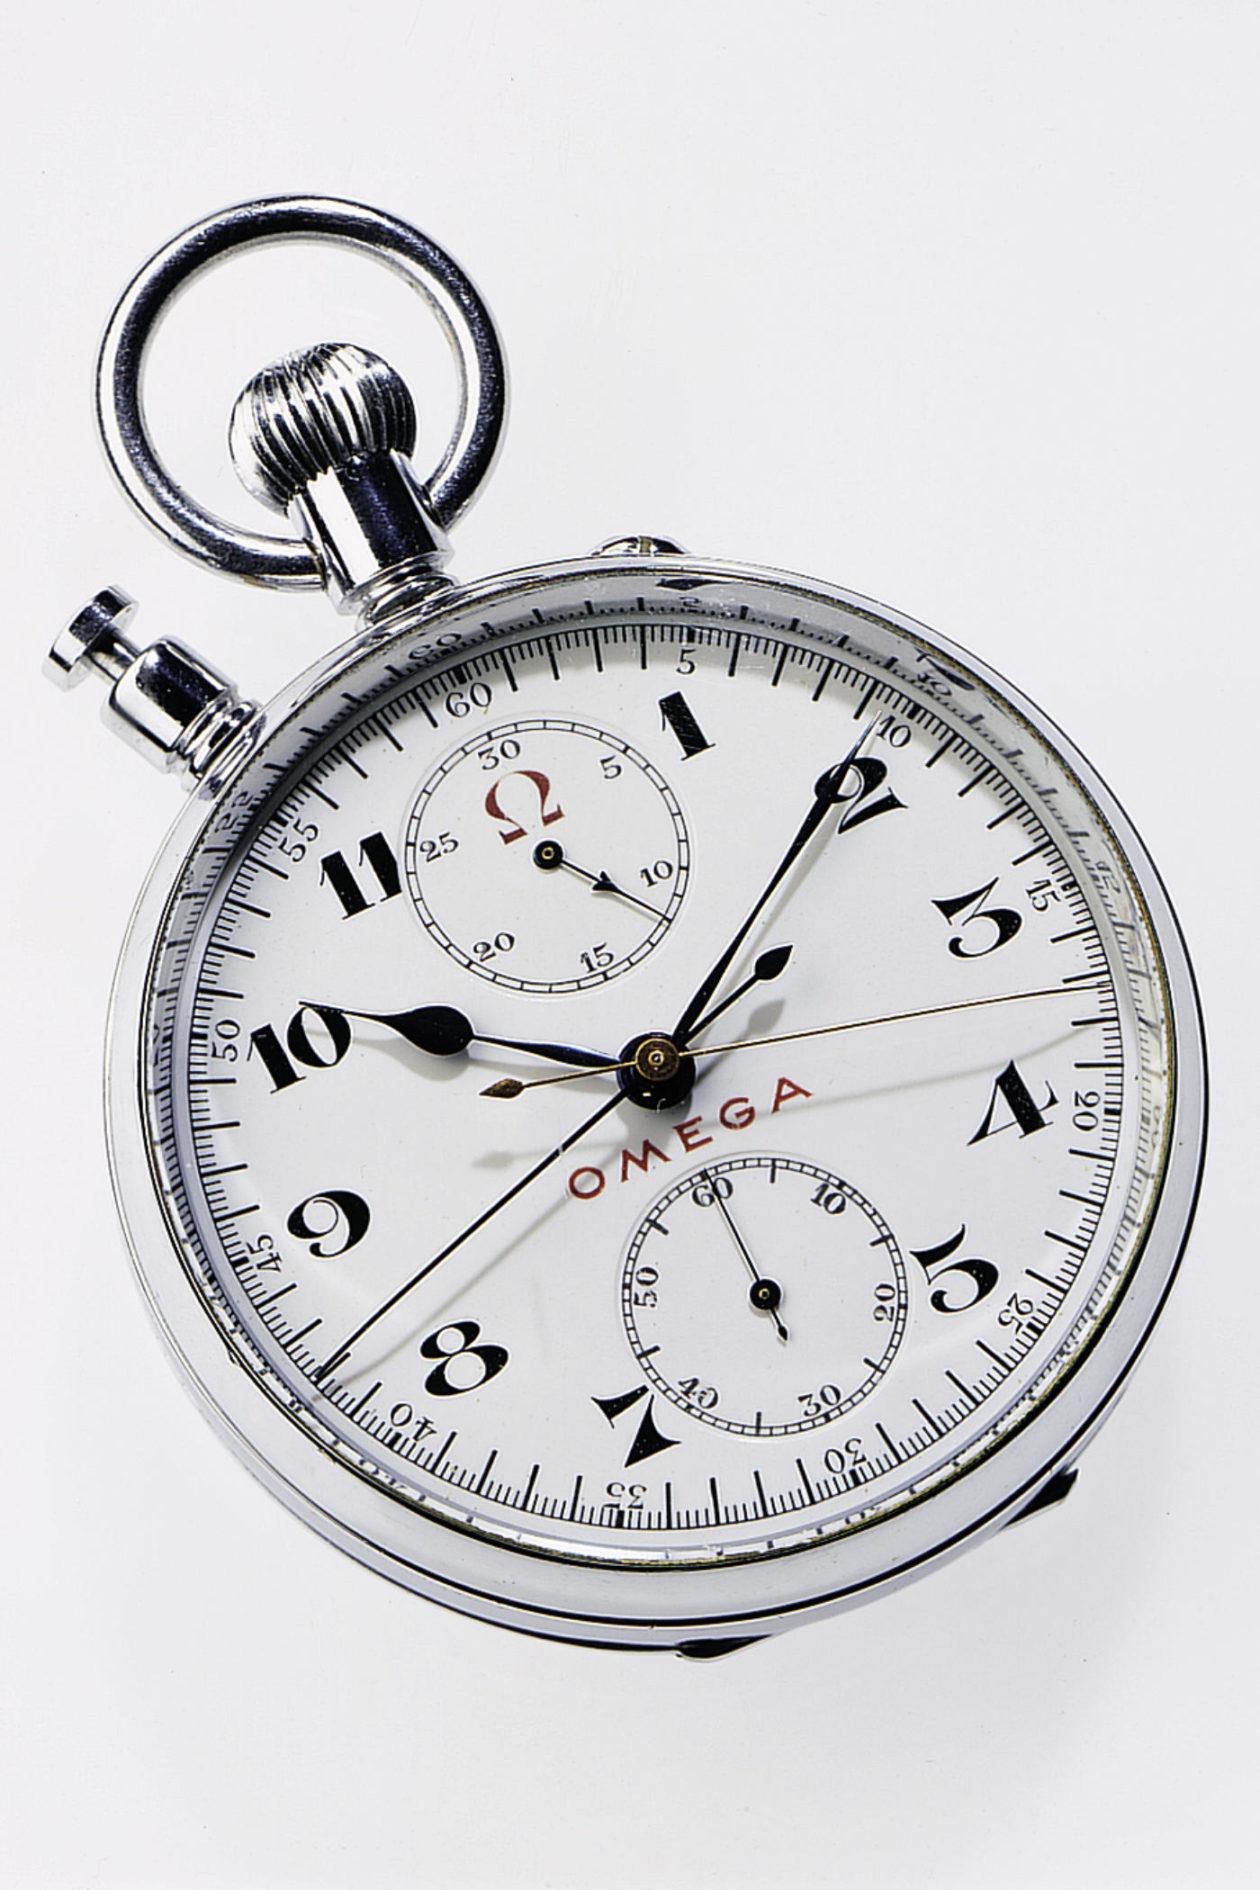 Omega Chronograph Rattrapante